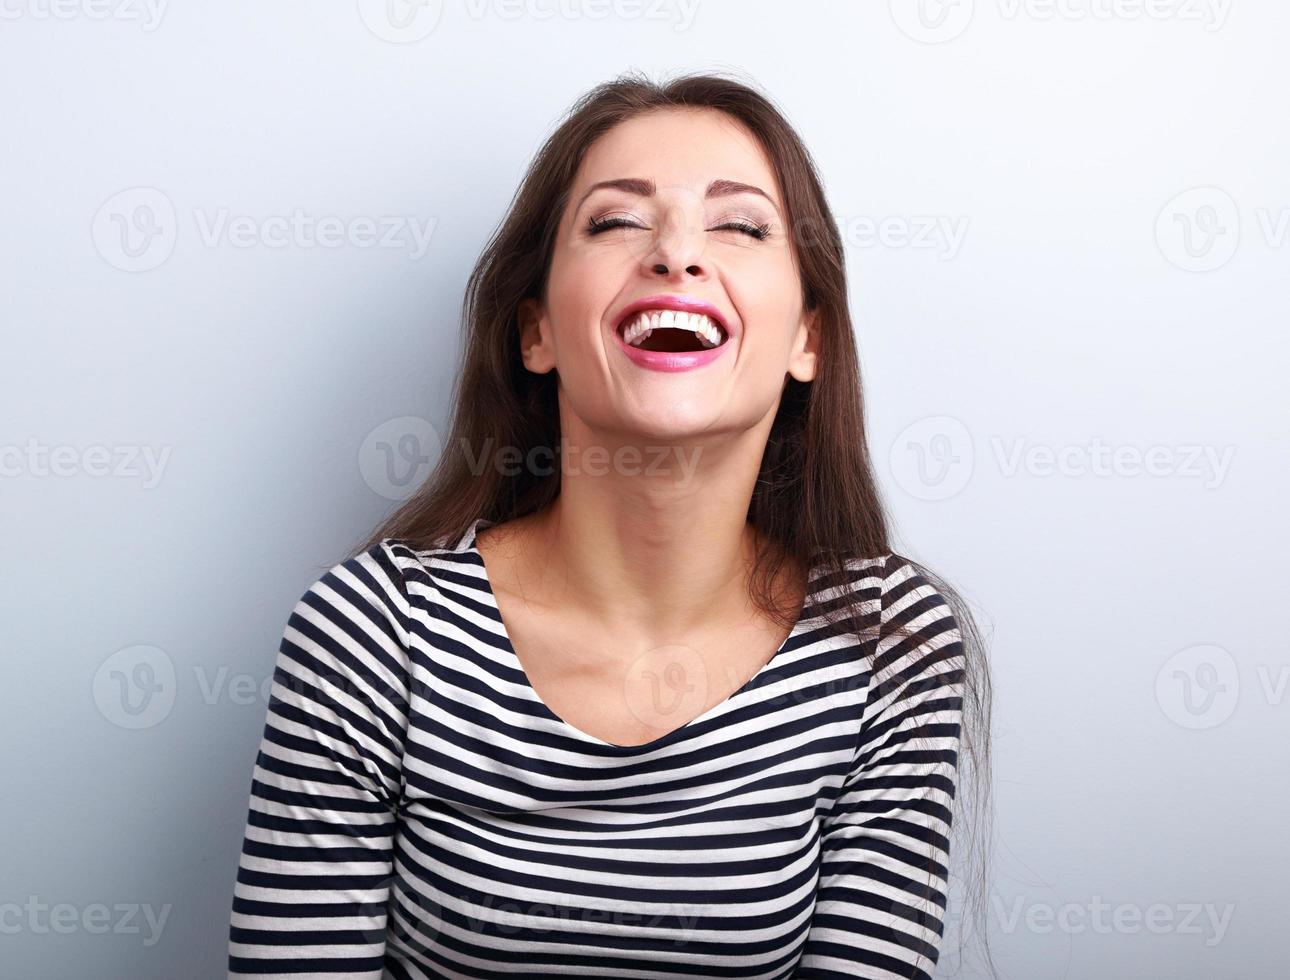 feliz natural rindo jovem casual com a boca aberta foto